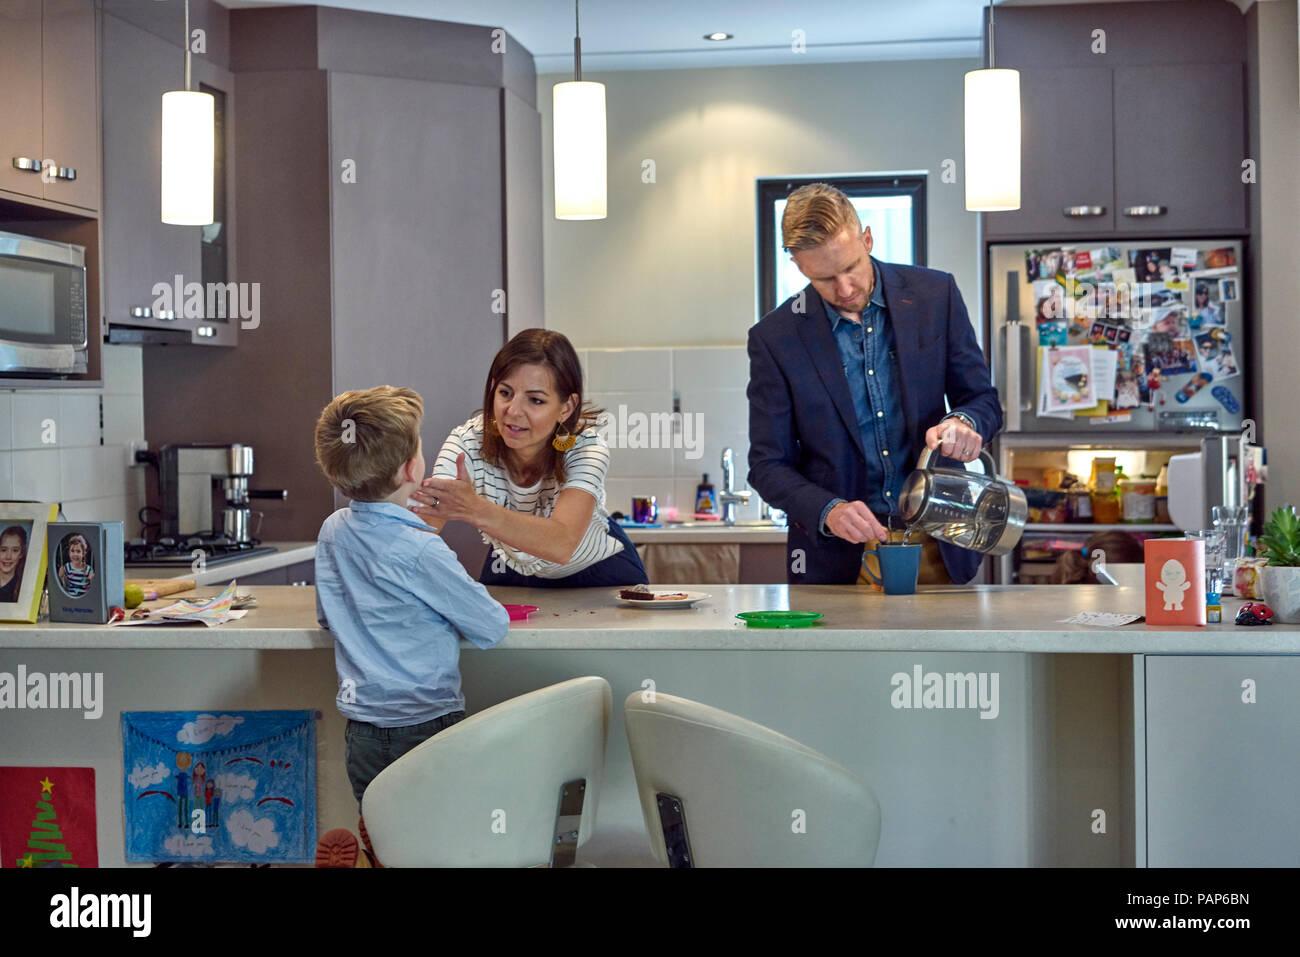 Scena quotidiana di una famiglia in cucina a casa Immagini Stock